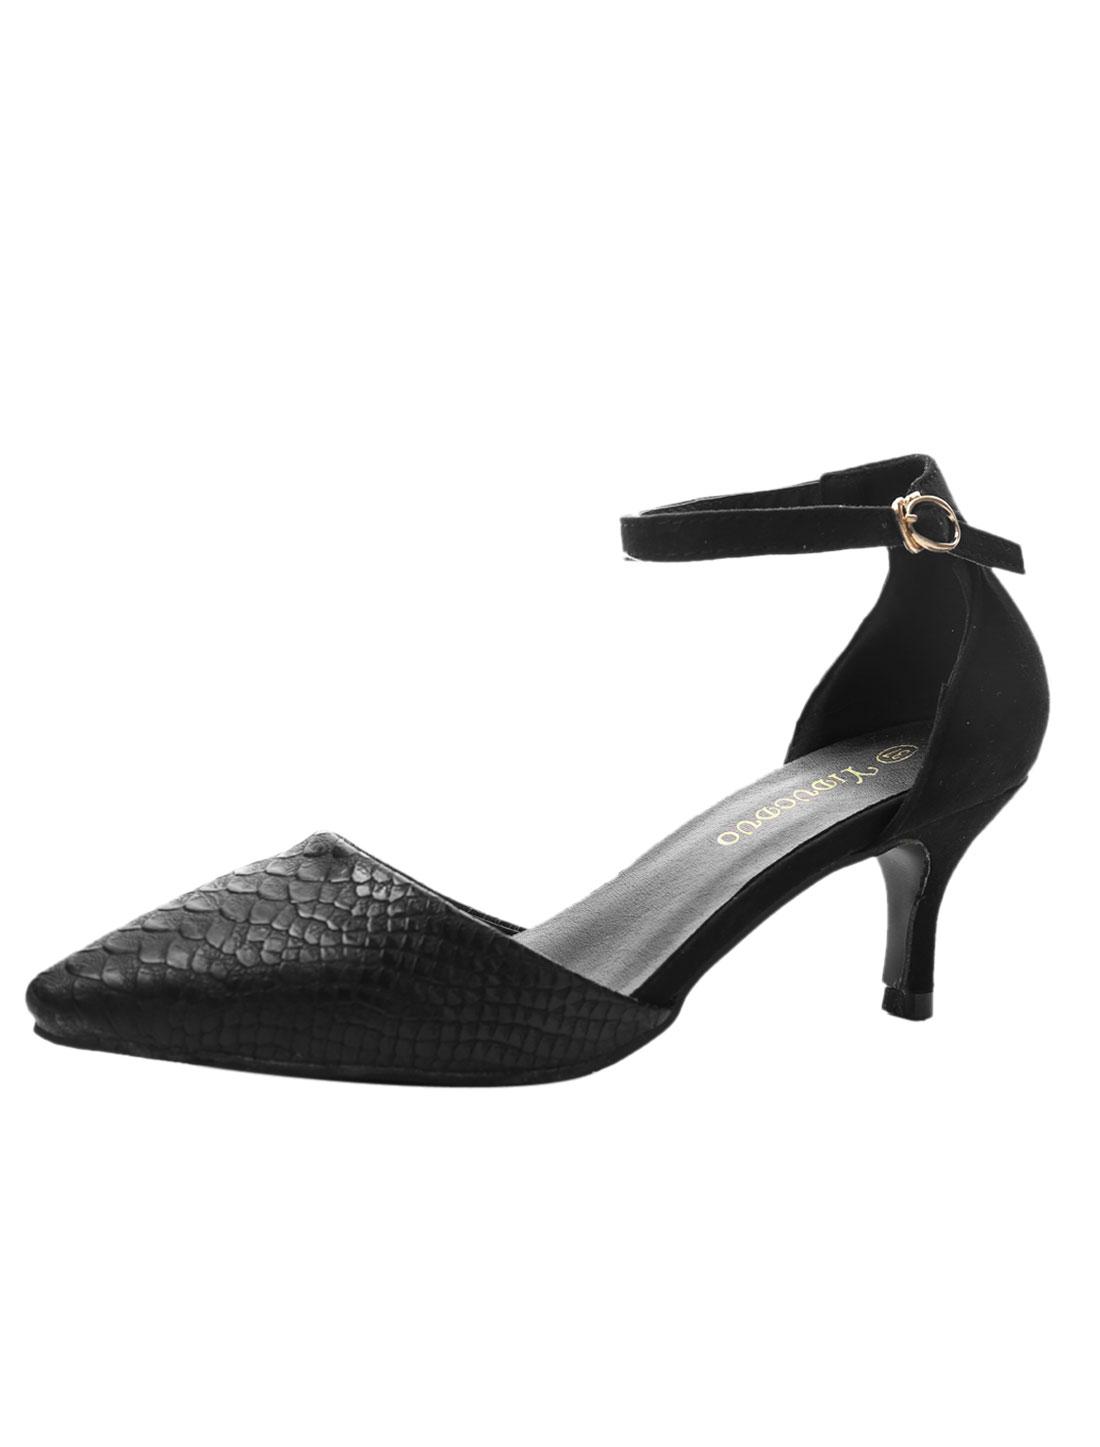 Women Pointed Toe Ankle Straps Kitten Heel Shoes Black US 6.5